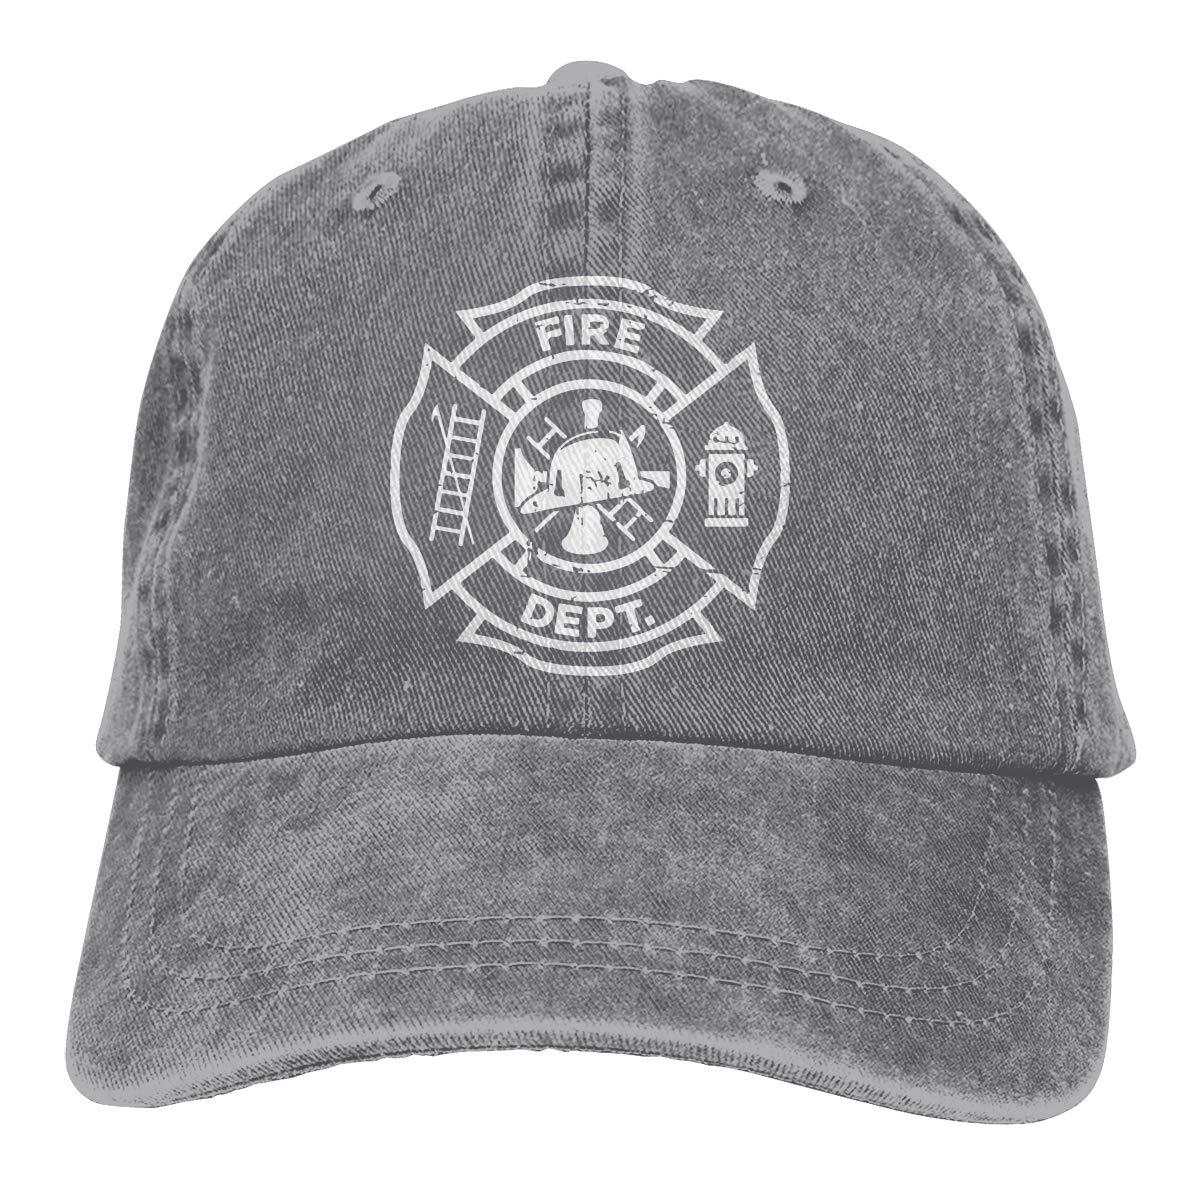 Adult Fashion Cotton Denim Baseball Cap Firefighter Logo Classic Dad Hat Adjustable Plain Cap